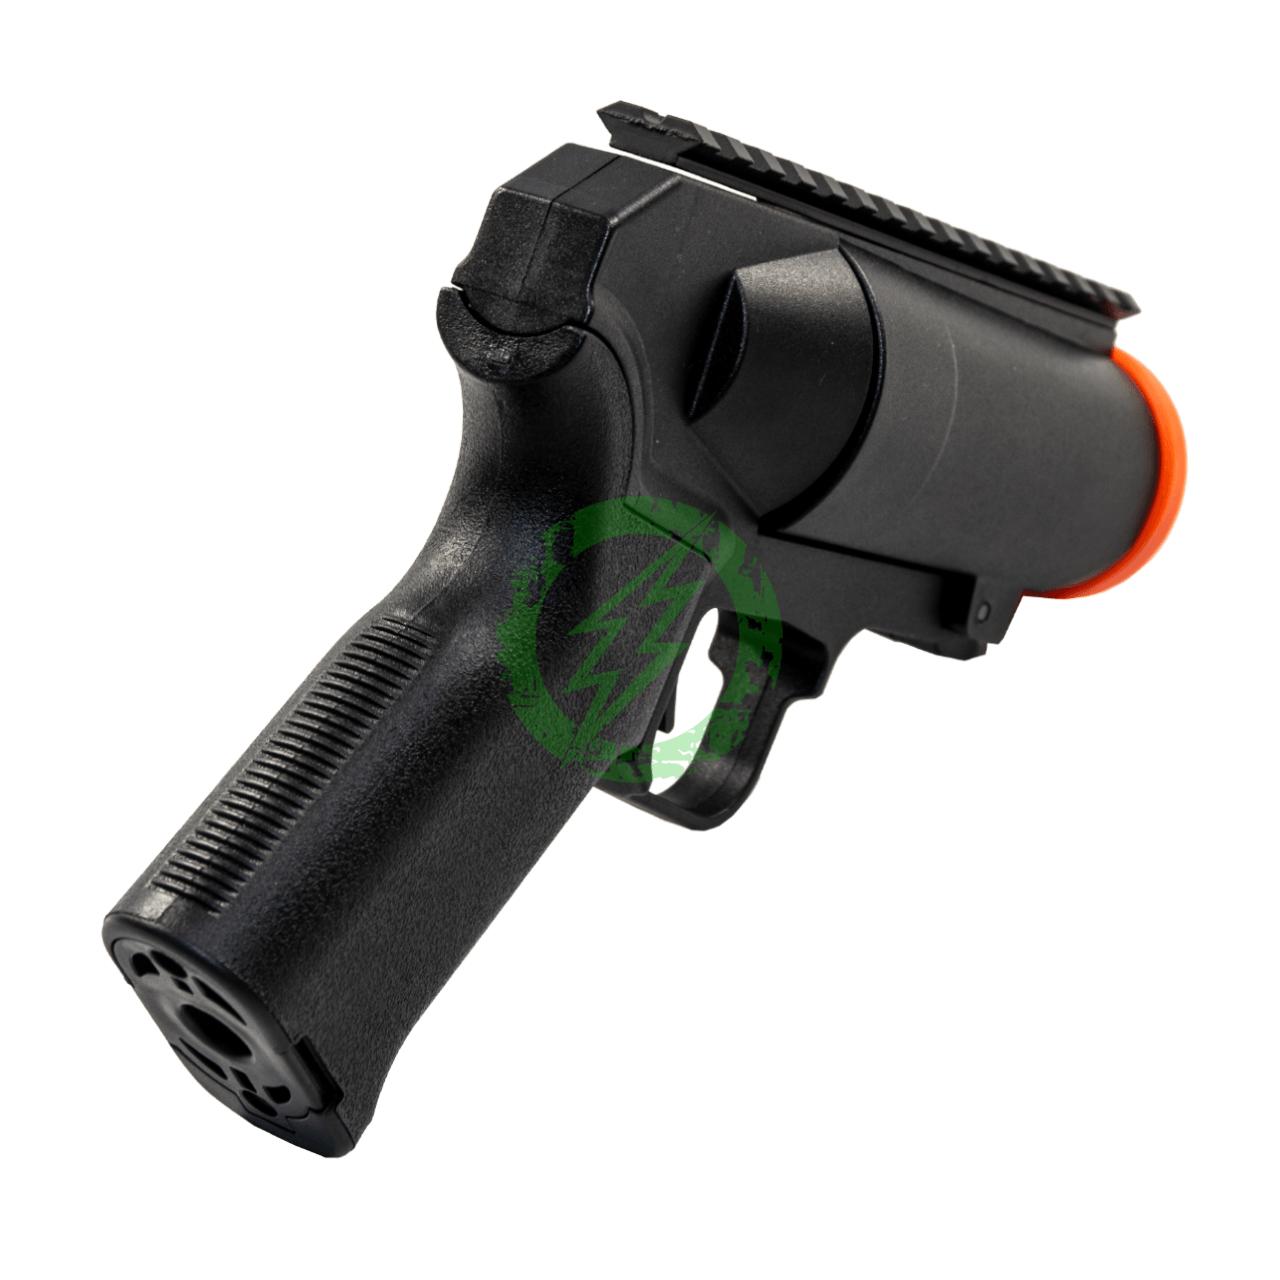 6mmProShop Airsoft Pocket Cannon Grenade Launcher Pistol grip